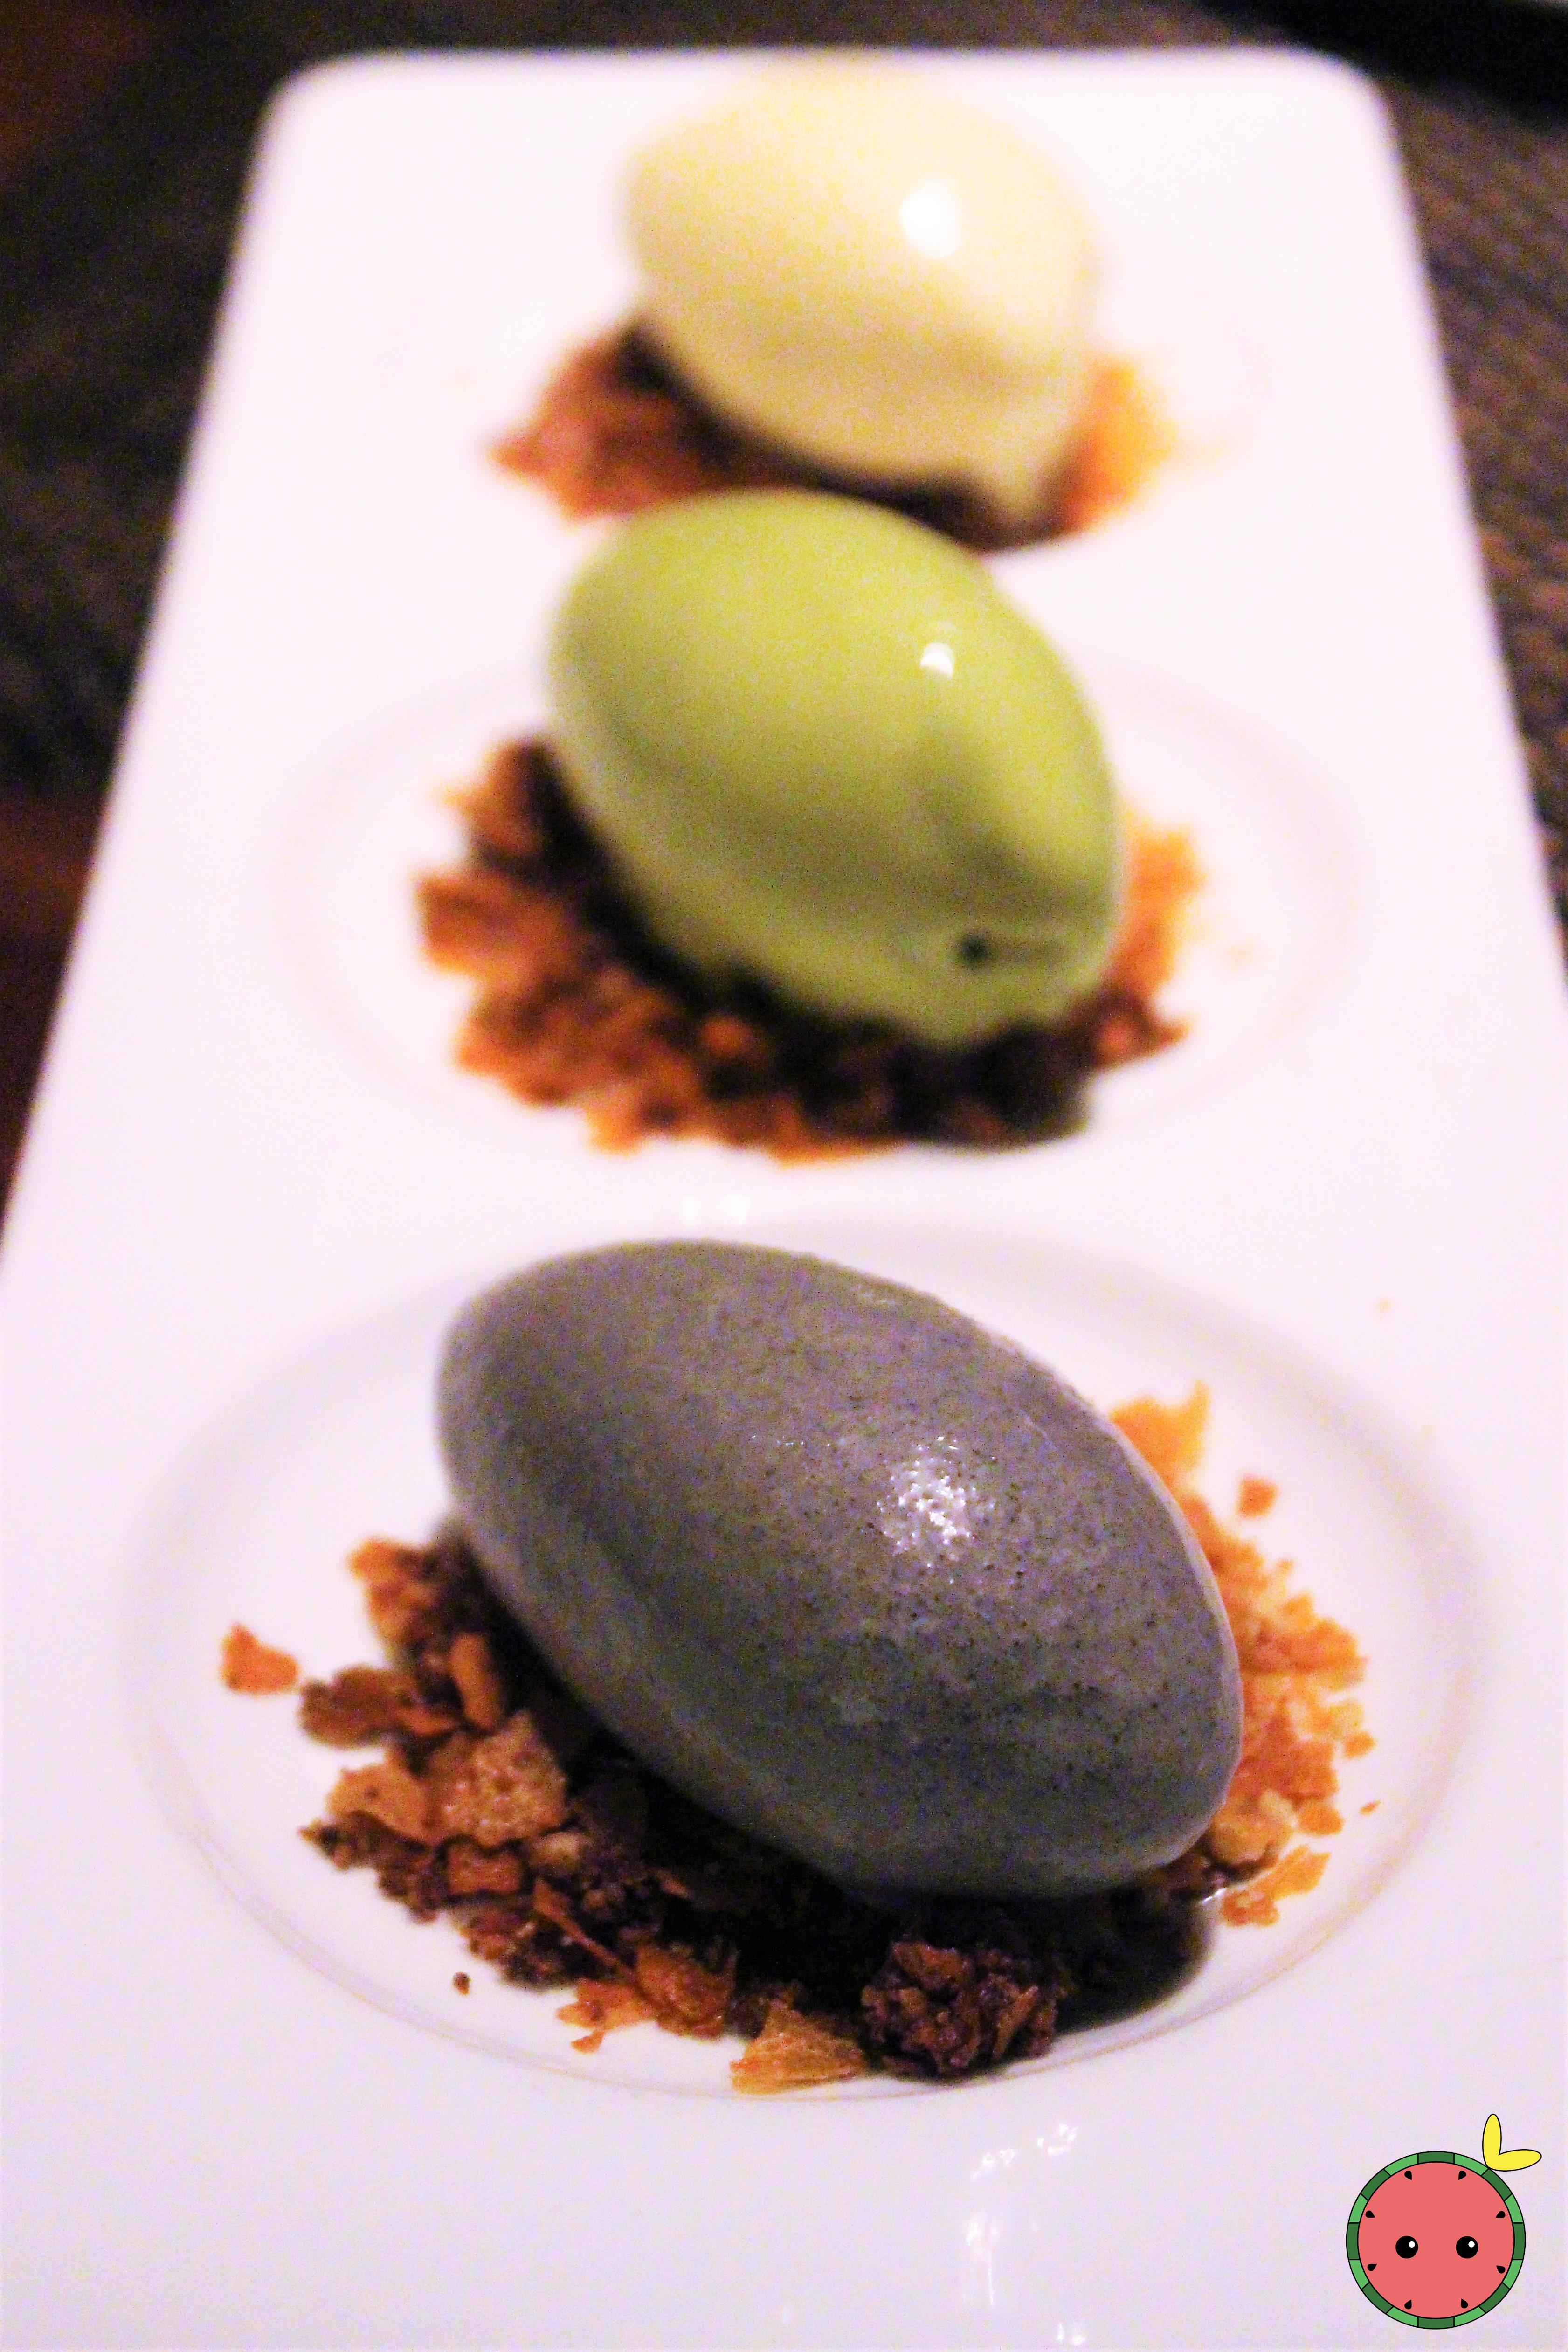 Ice Cream Trio - Black Sesame, Tahitian Vanilla, Green Tea